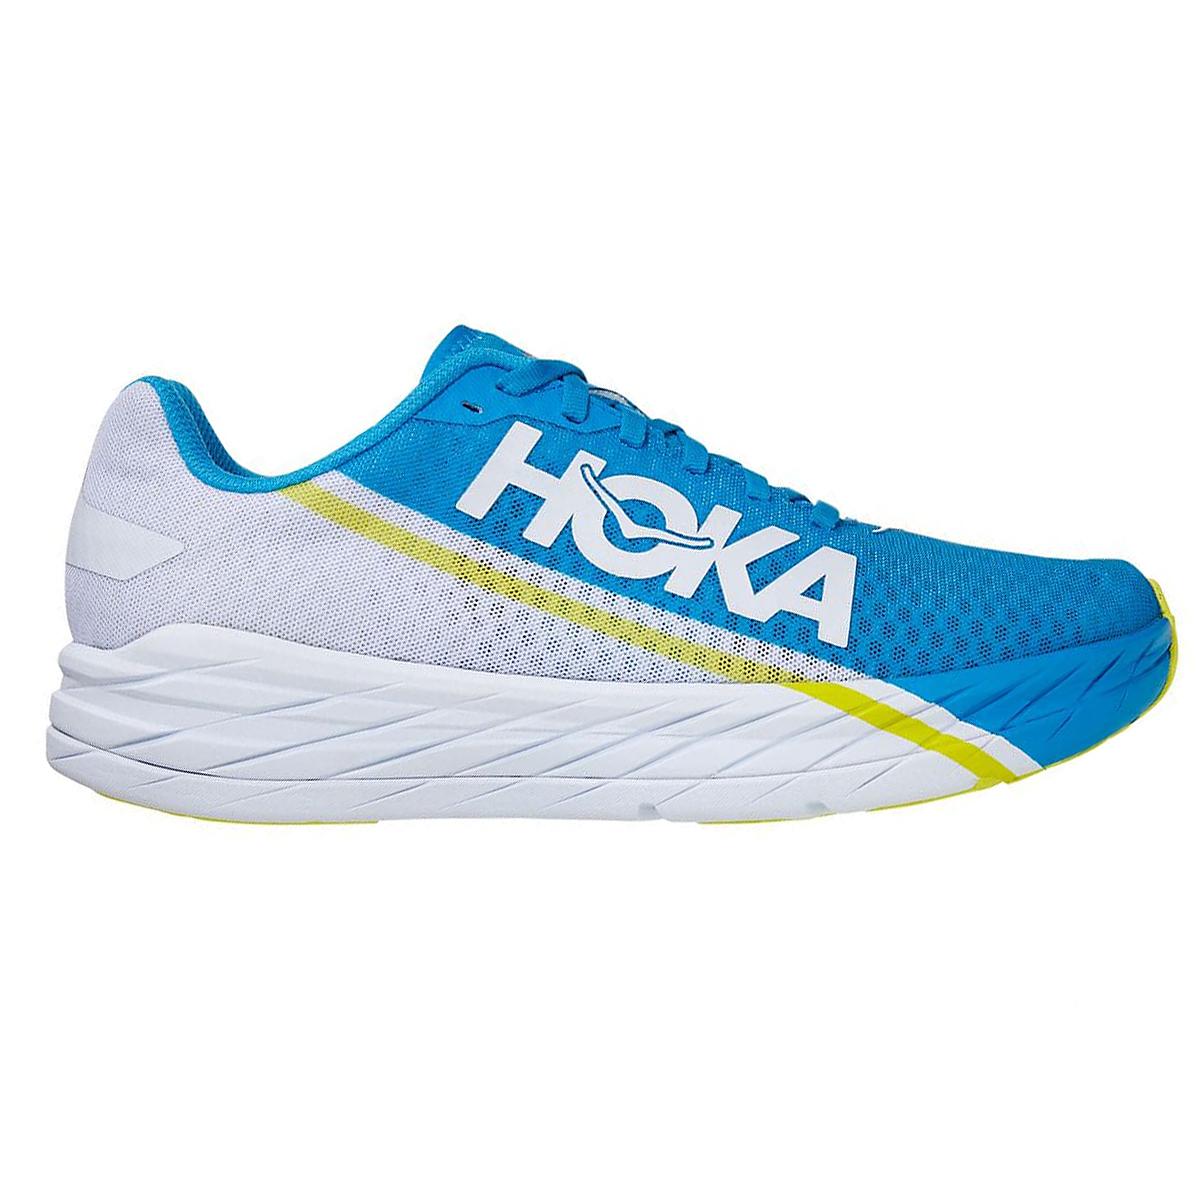 Hoka One One Rocket X Running Shoe - Color: White/Diva Blue - Size: M5/W6 - Width: Regular, White/Diva Blue, large, image 1